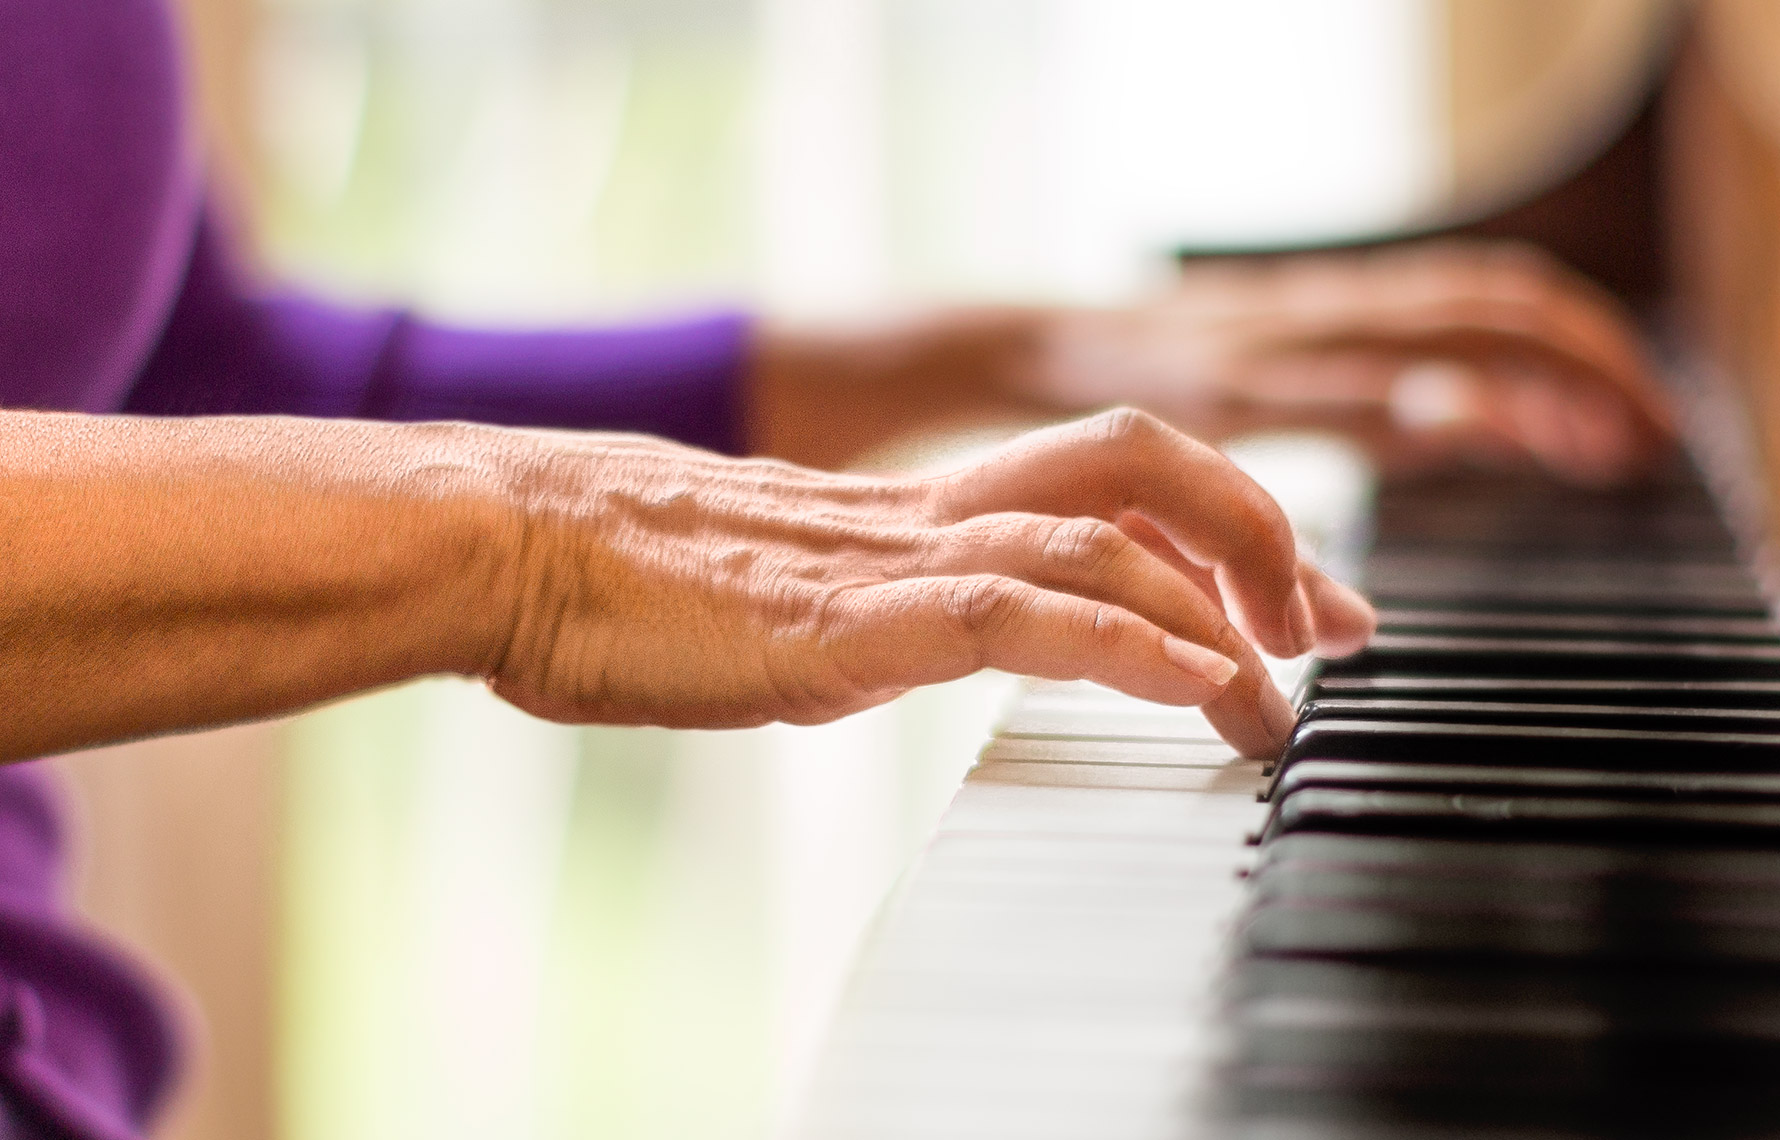 Woman-Playing-Piano-29-1c1web.jpg